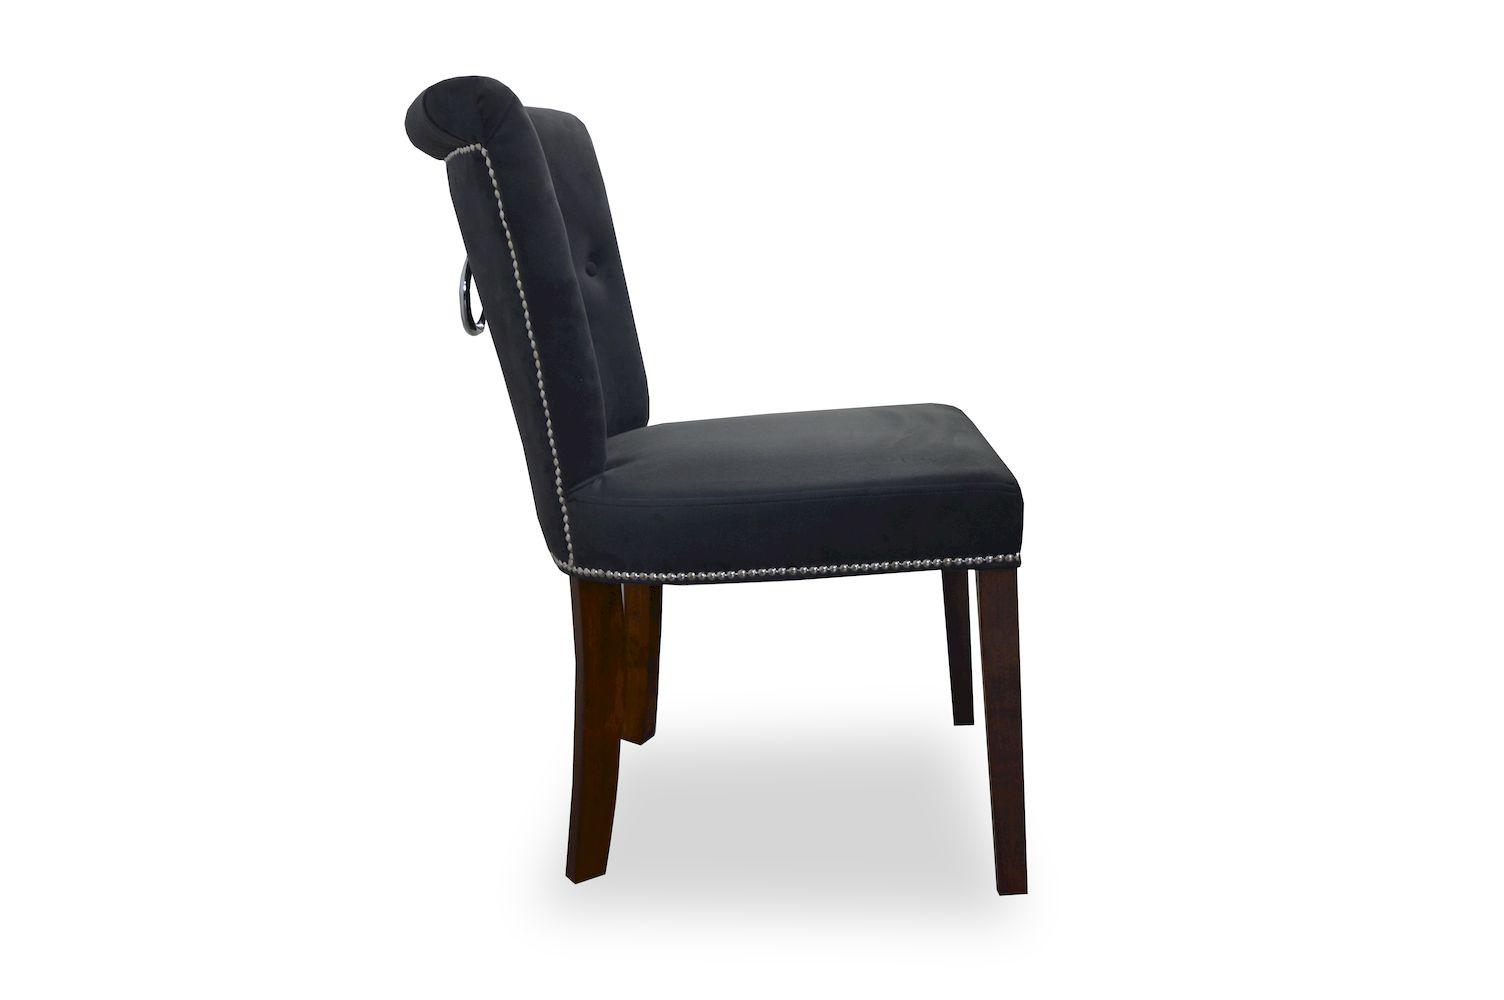 Židle Miraclin s klopadlem-  různé barvy